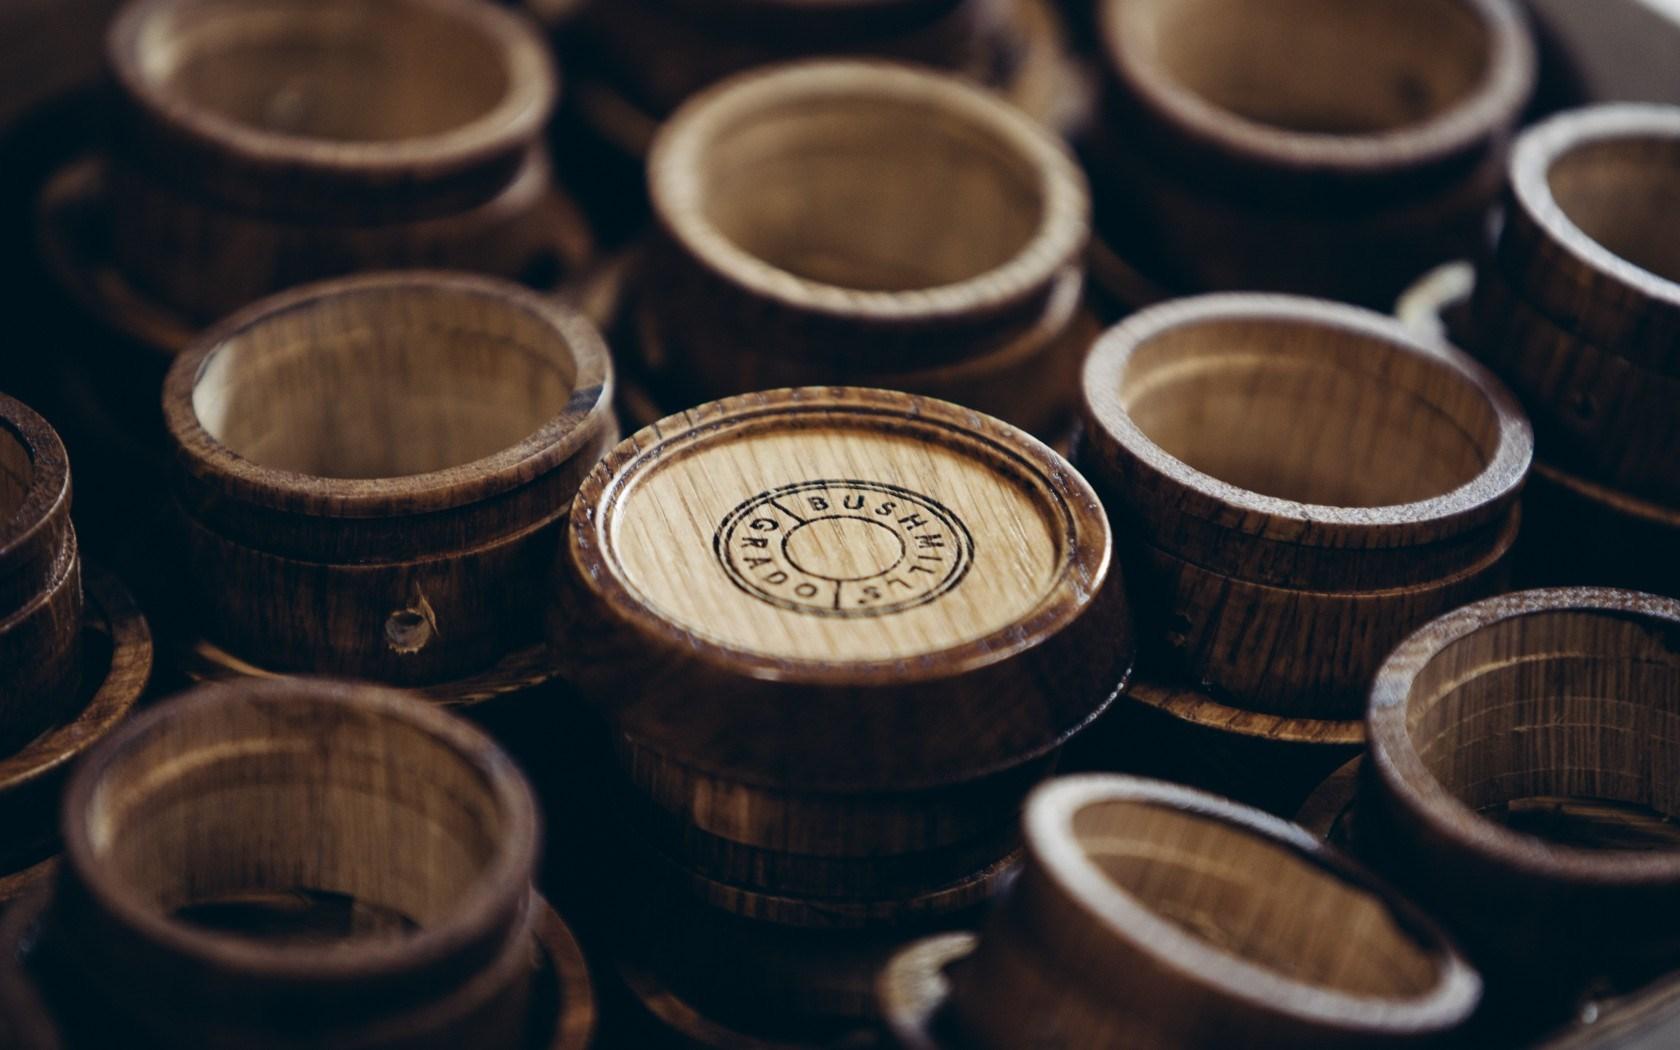 Elijah Wood and Zach Cowie Bushmills Irish Whiskey Barrels Grado Labs Headphones